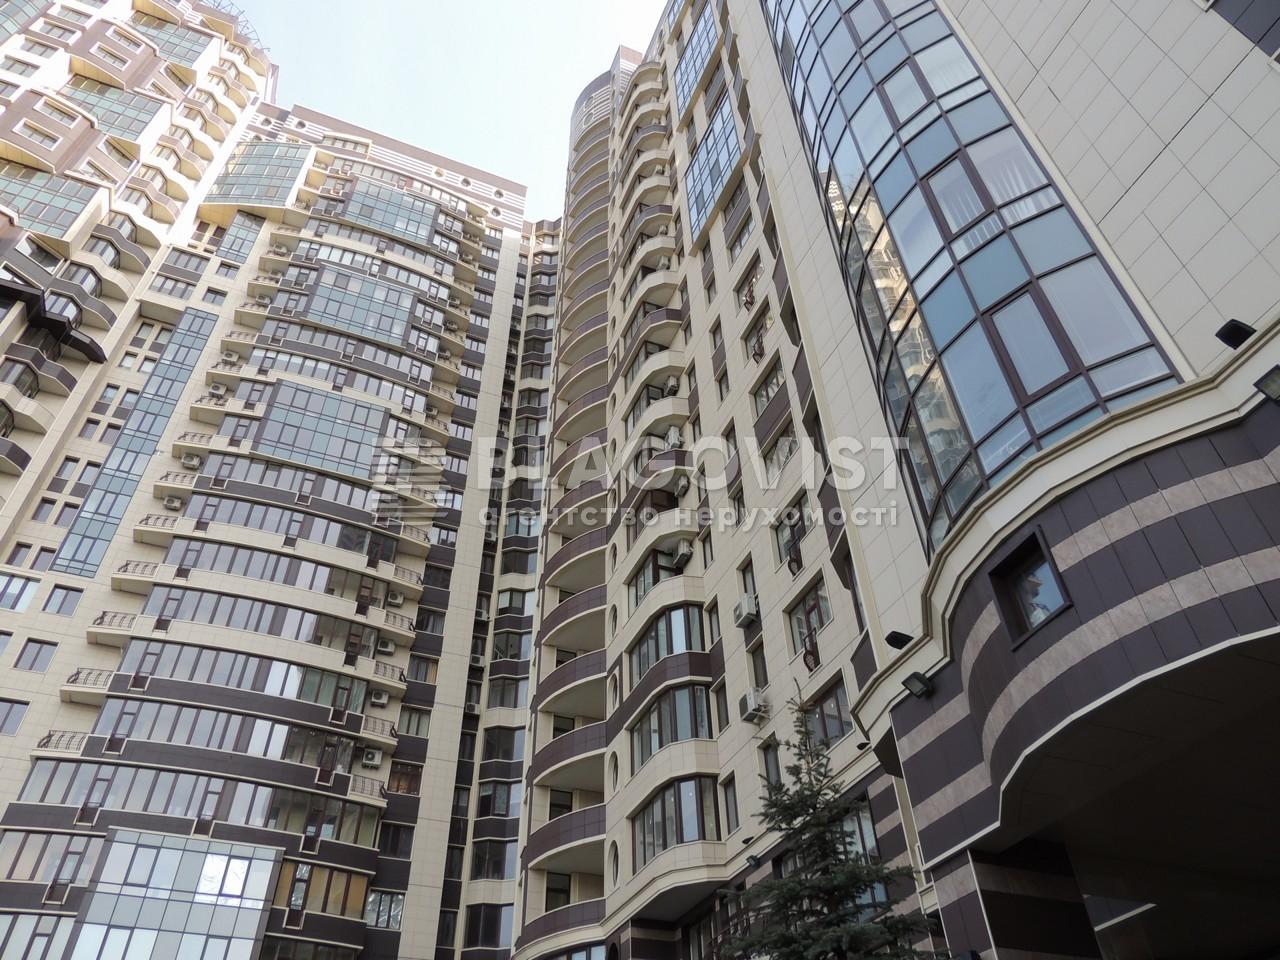 Квартира E-36118, Барбюса Анри, 37/1, Киев - Фото 2